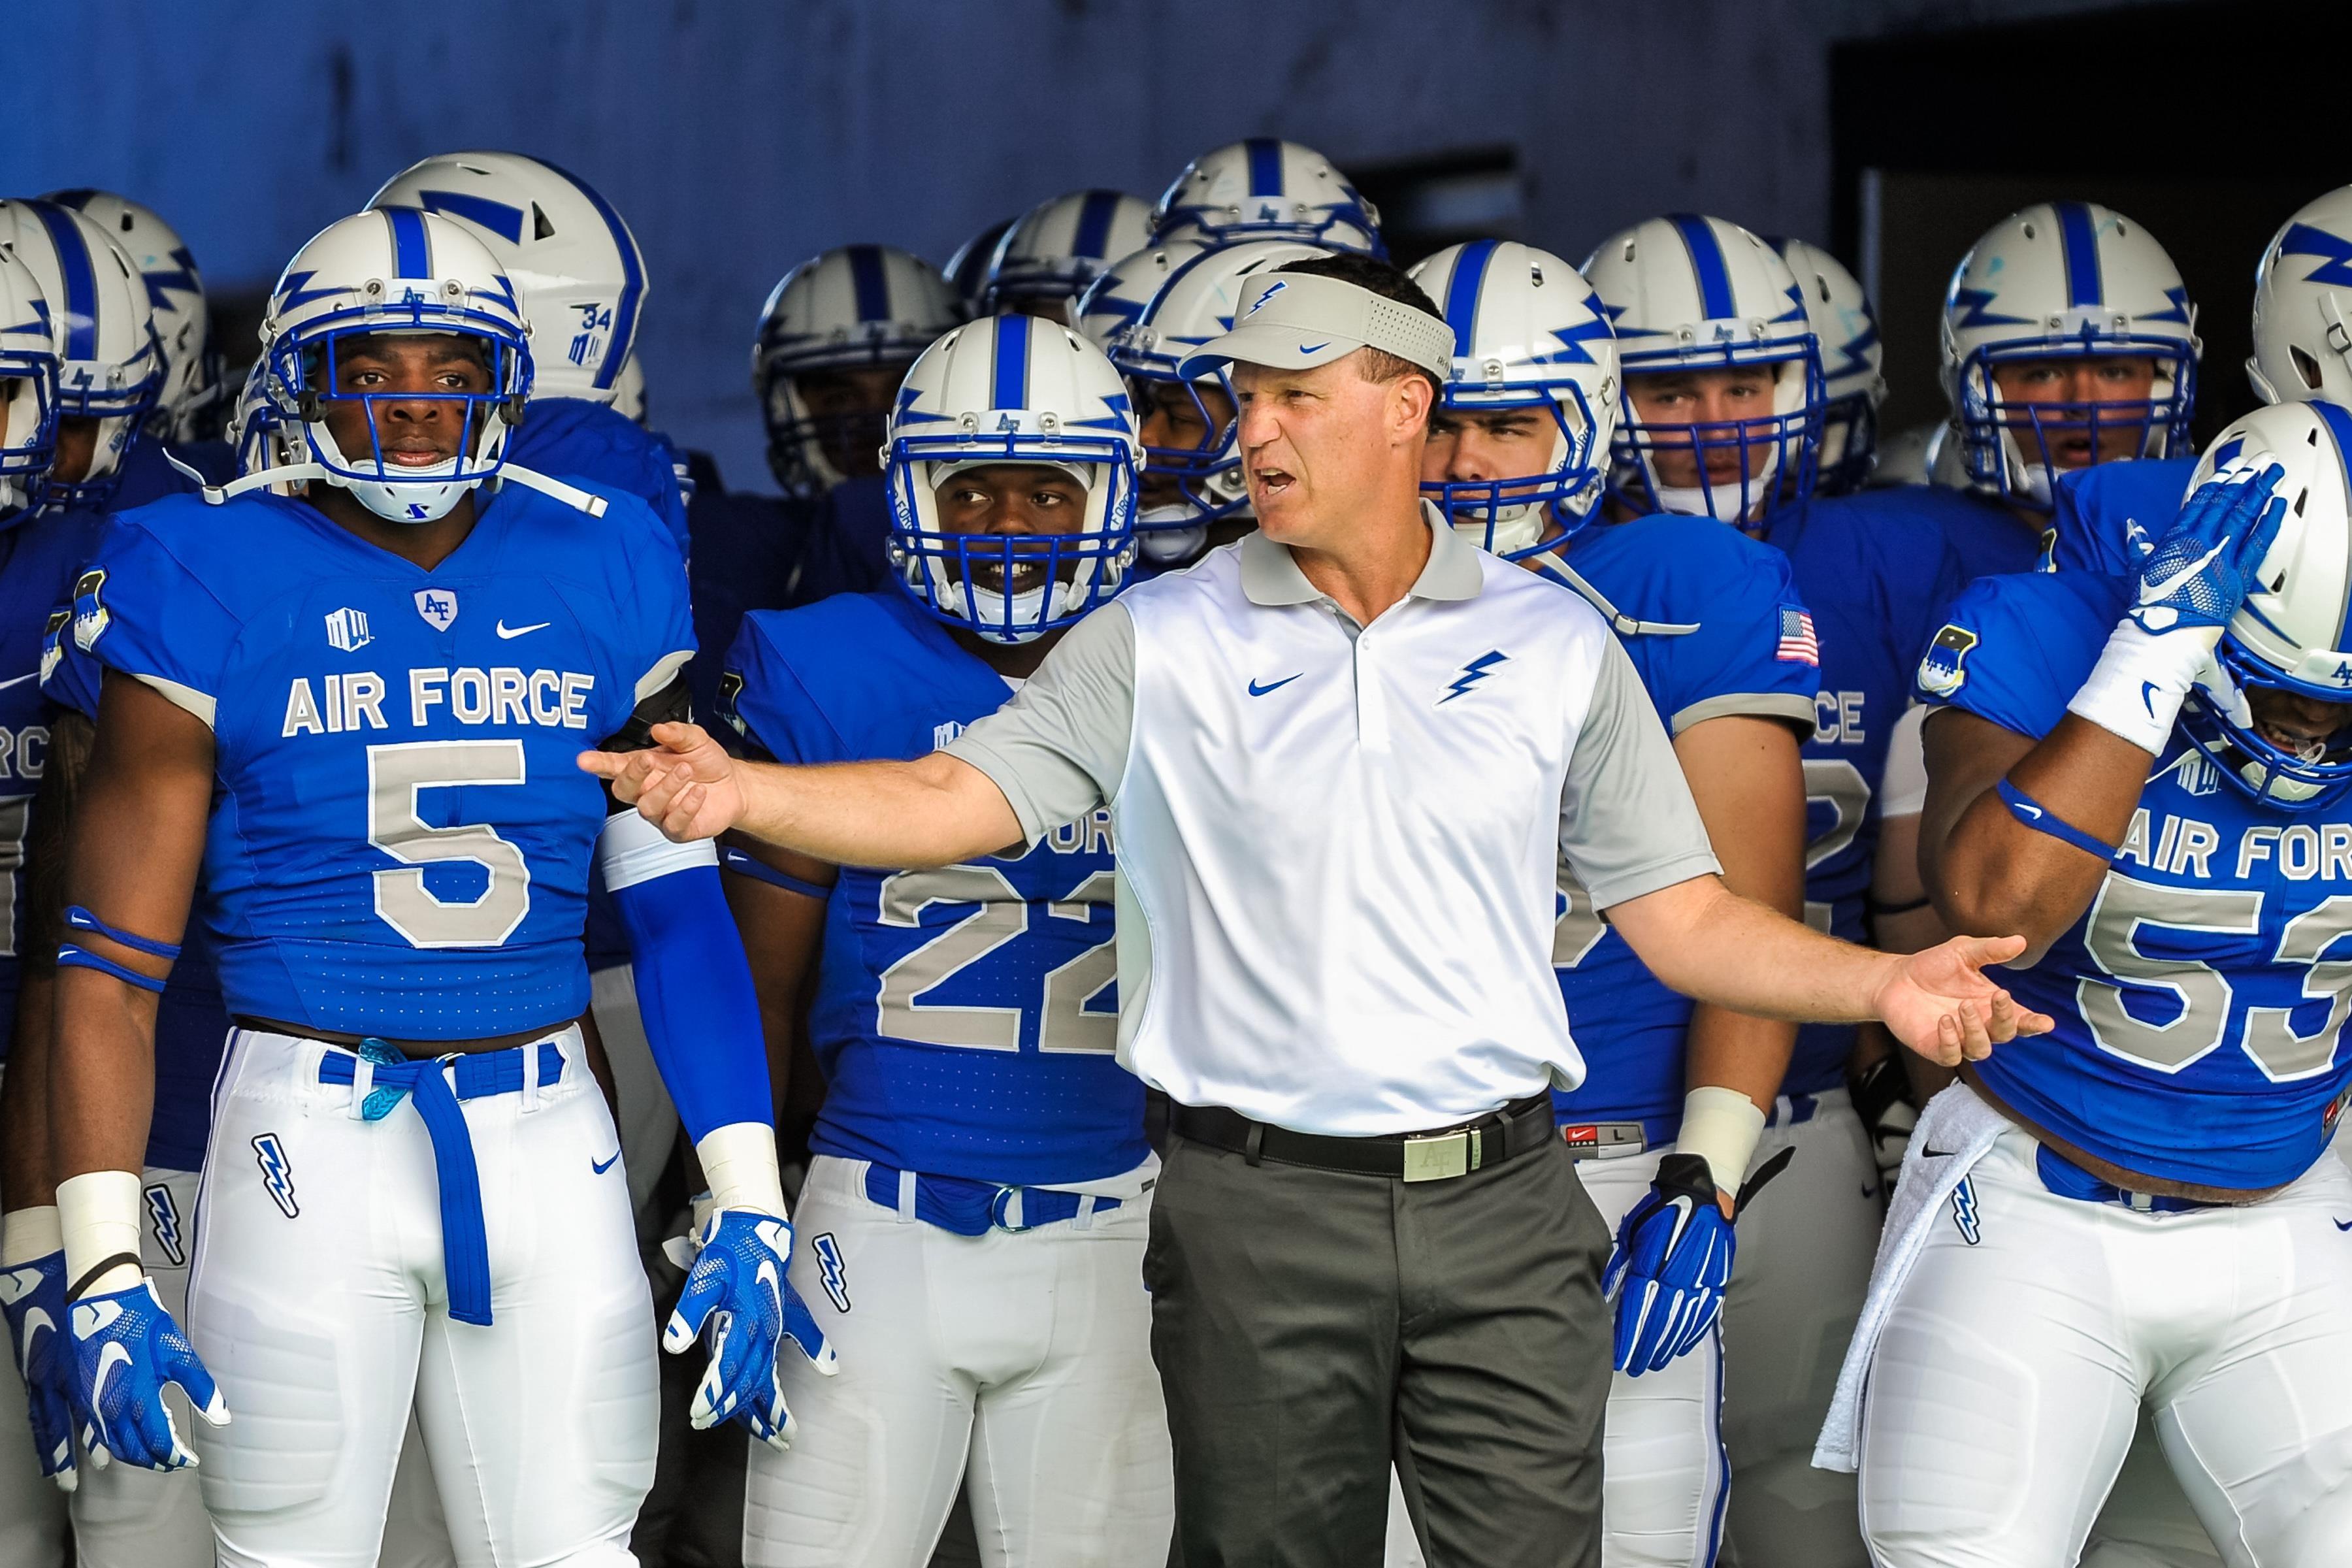 Falcon football head coach Troy Calhoun rallies his team